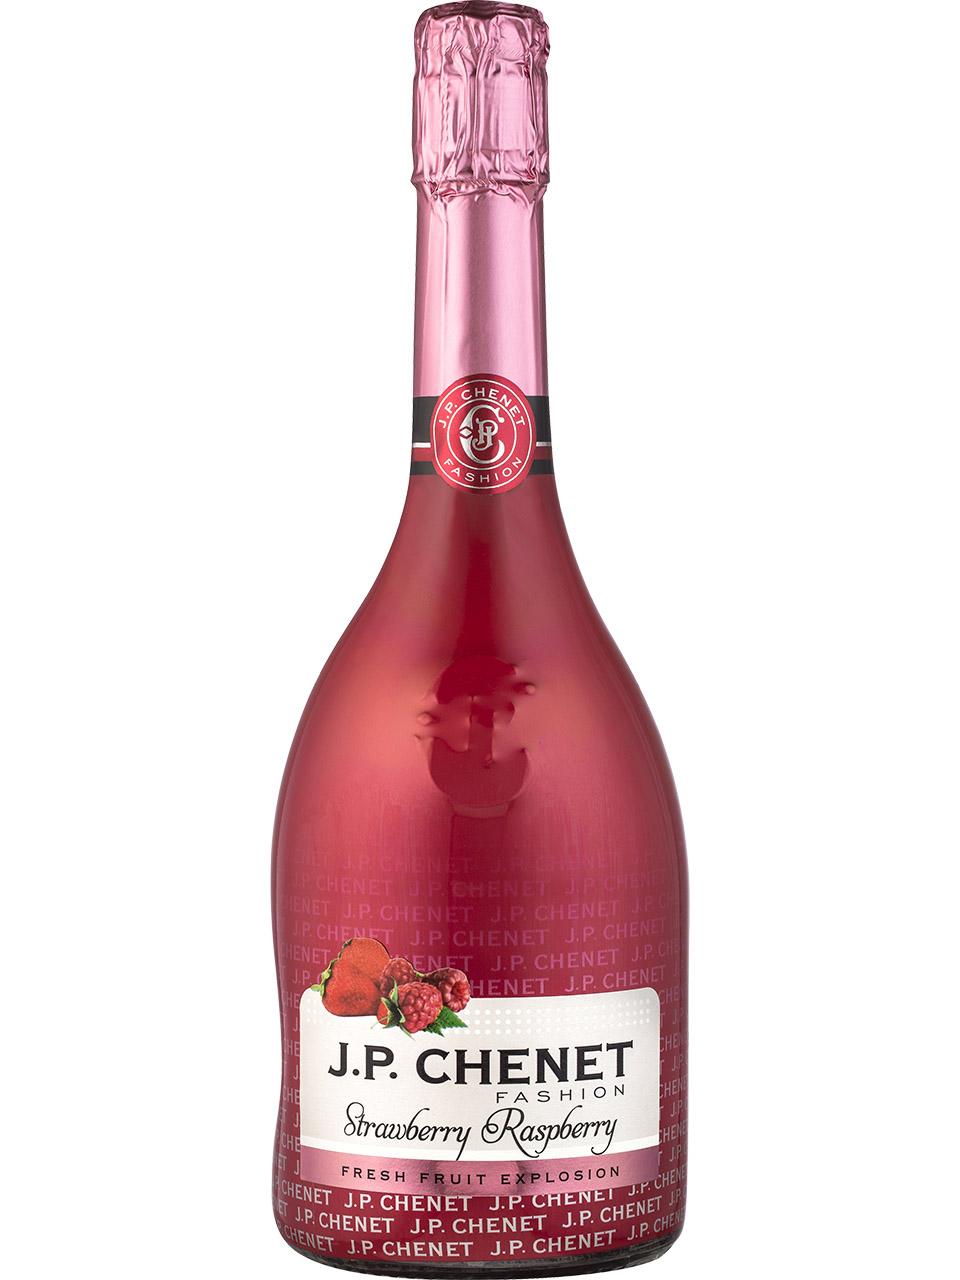 J.P. Chenet Fashion Strawberry/Raspberry Sparkling